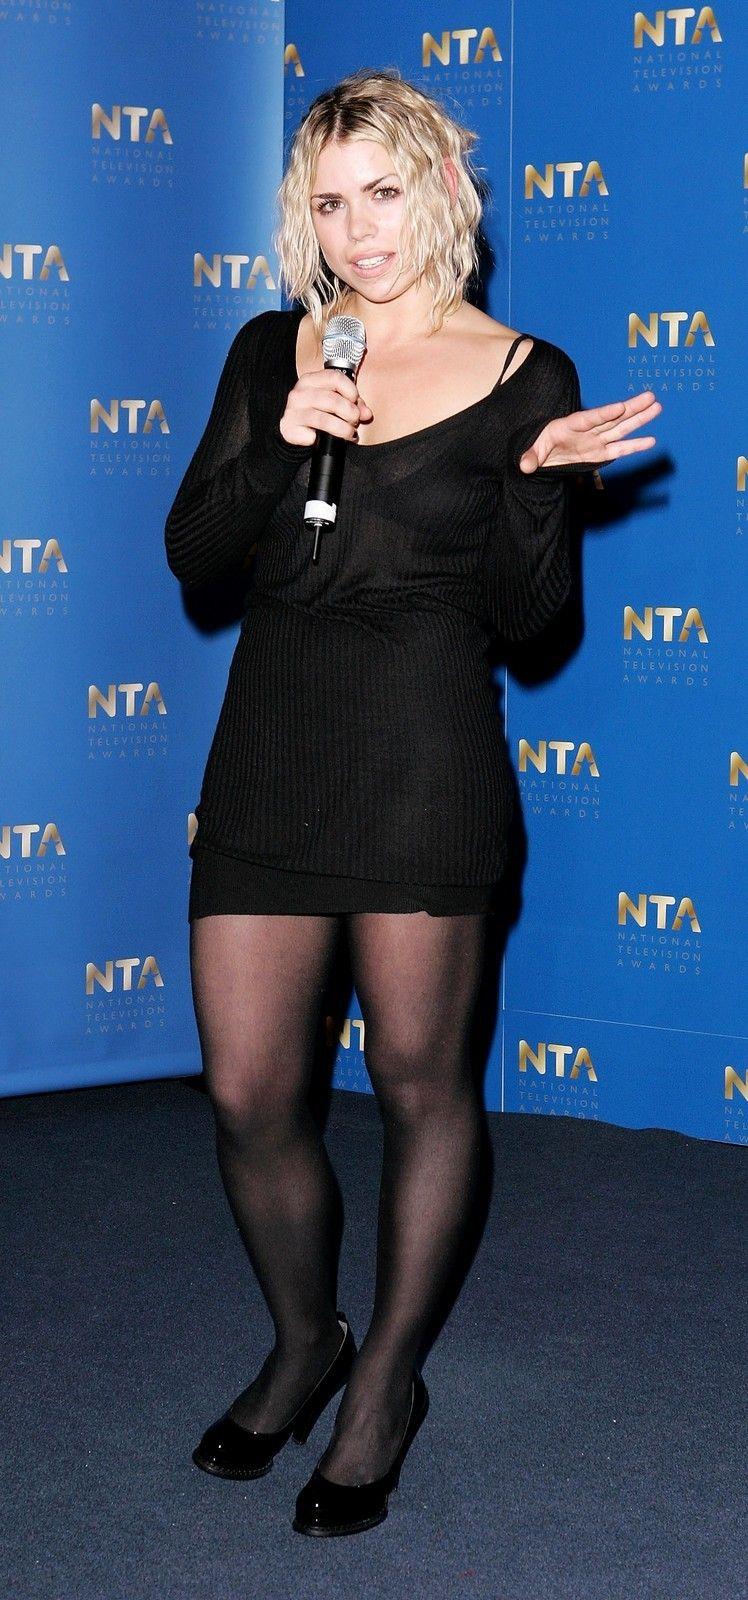 Billie Piper in 2005. Celebrities in stockings, Billie